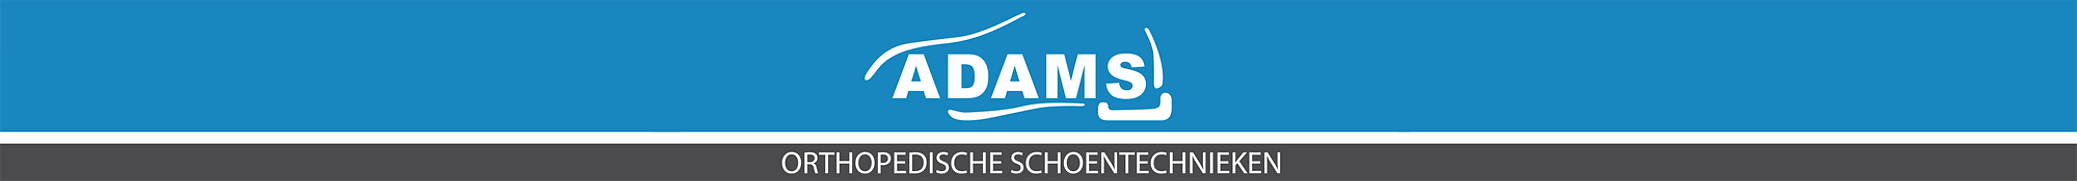 Logo lang adams.png